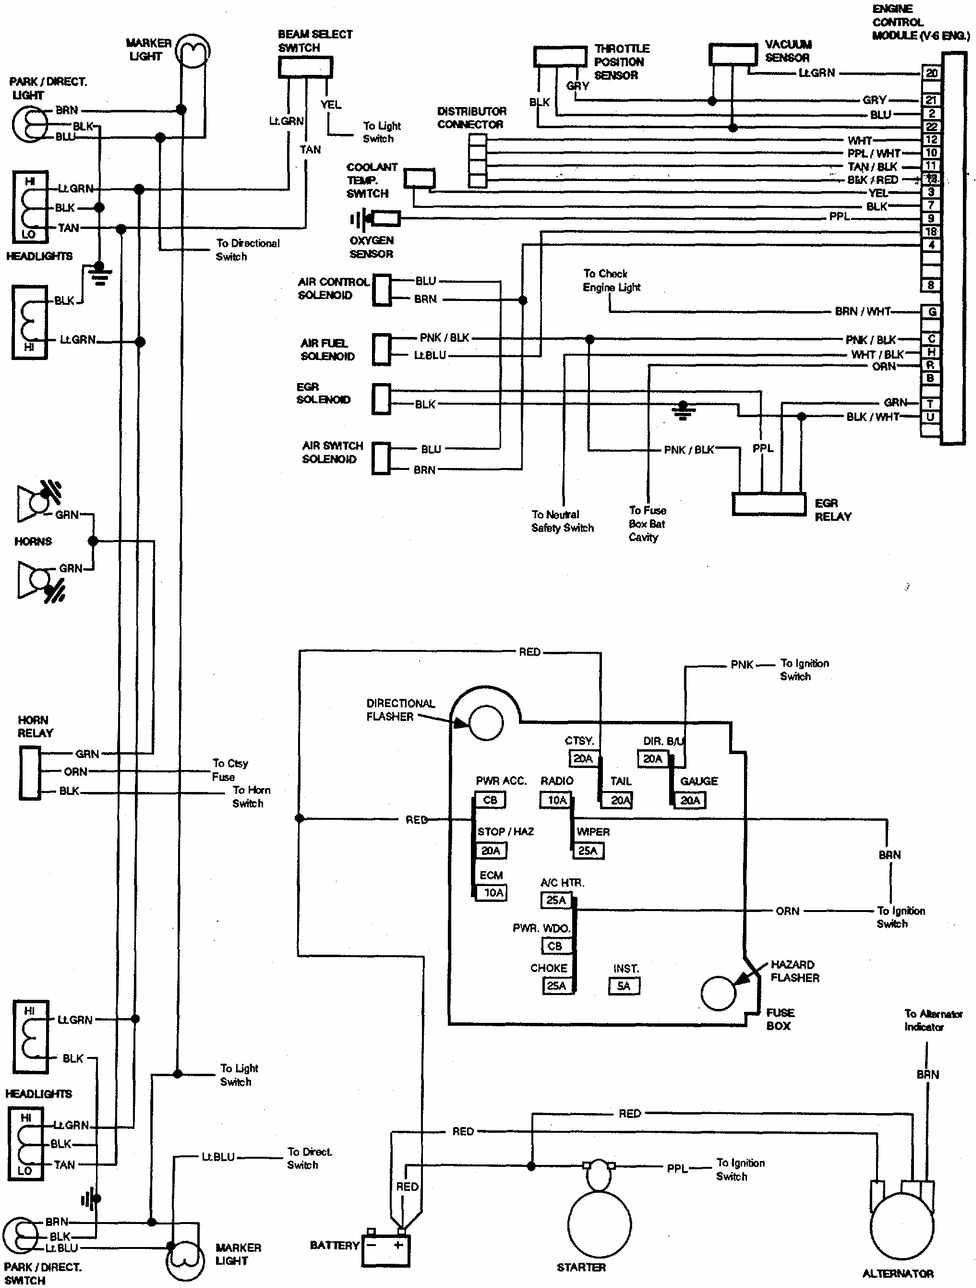 1981 Mustang Wiring Diagram - wiring diagrams schematics